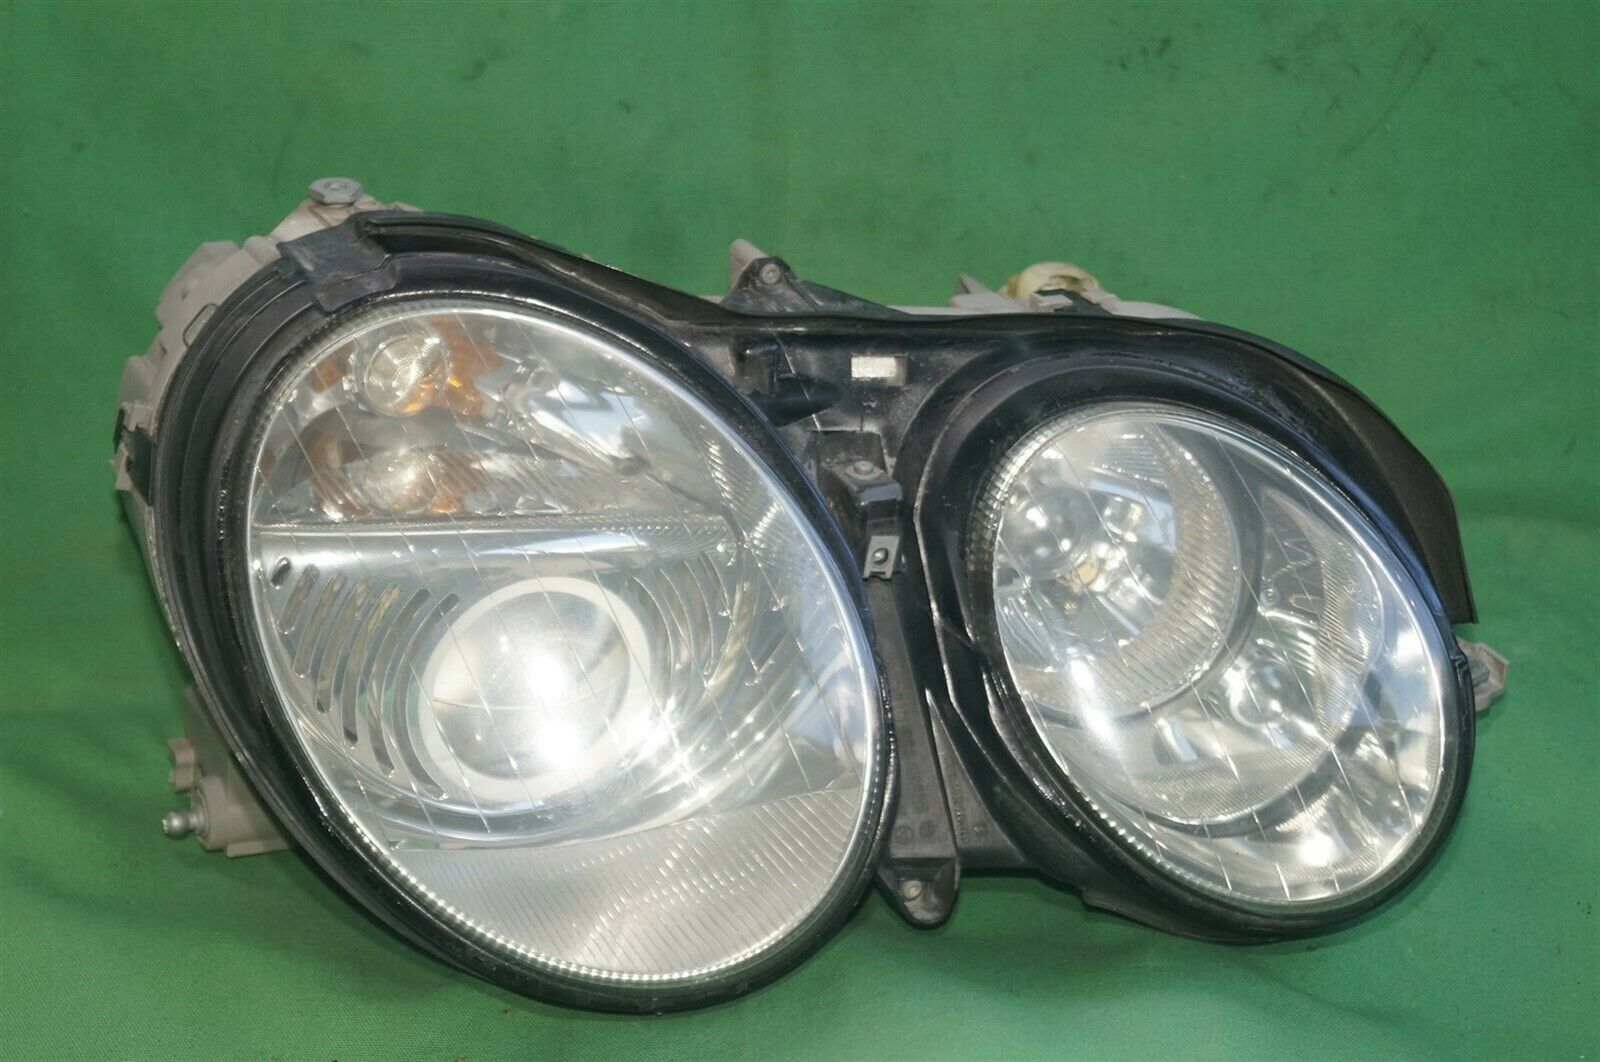 03-06 Mercedes W215 CL500 CL600 CL55 AMG Xenon HID Headlight Passenger Right RH